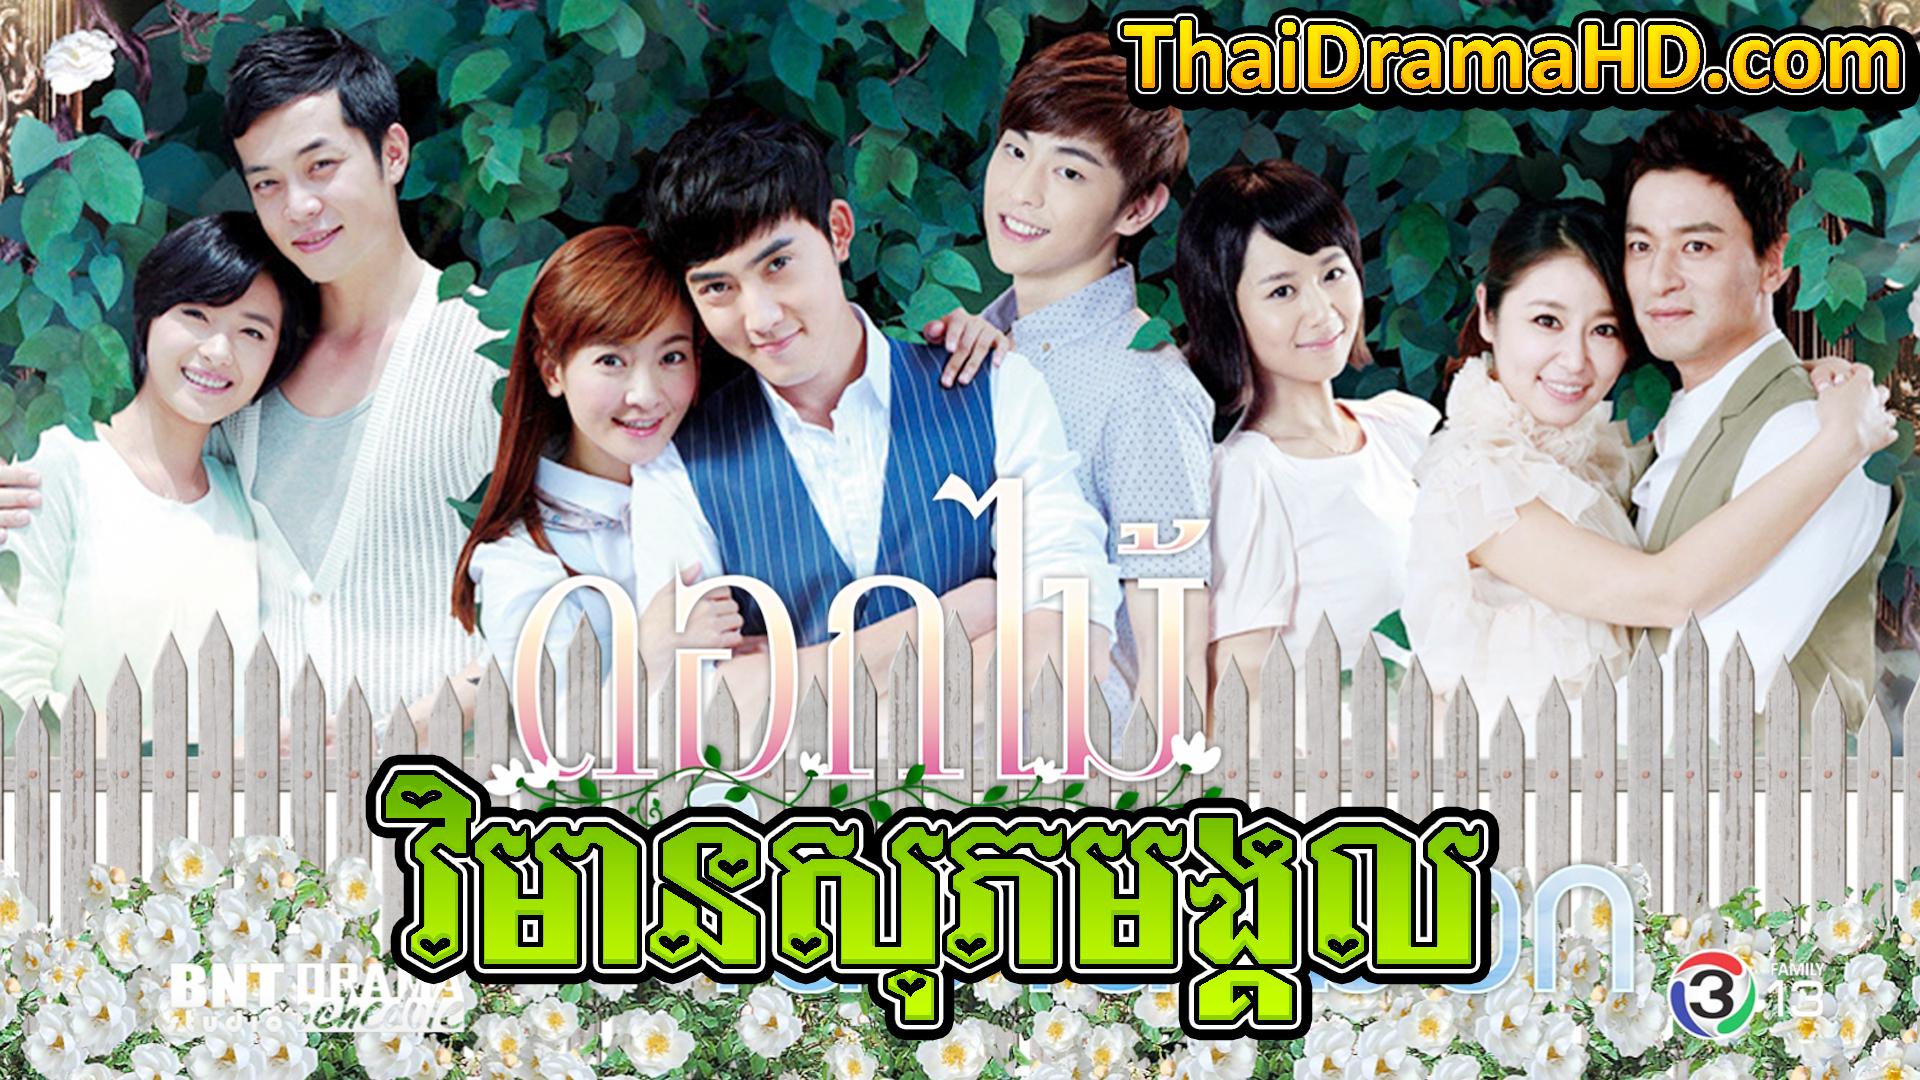 Vimean Sopheak Mongkul | Thai Drama | Khmer Movie | Phumikhmer | movie-khmer | video4khmer | khmotions | kolabkhmer | khmer drama | ksdrama | cookingtips | roscheat | khmertimeskh | khmerkomsan | phumi7 | merlkon | film2us | movie2kh | sweetdrama | khmercitylove | khreplay | tvb cambodia drama | ckh7 | srokthai | phumimedia | phumi8 | khmer avenue | khmer search | Soyo | khmerfans